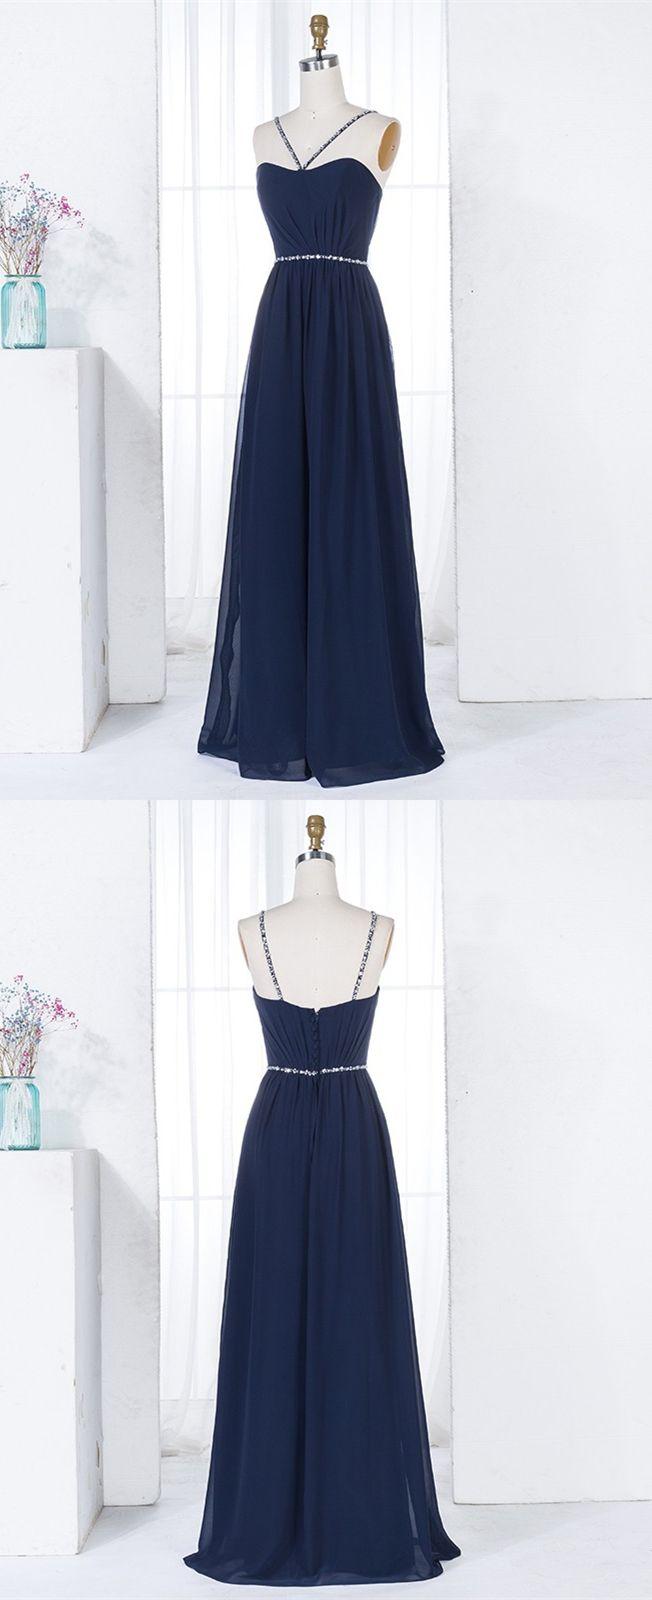 Aline vneck navy blue chiffon long bridesmaid dress with beading